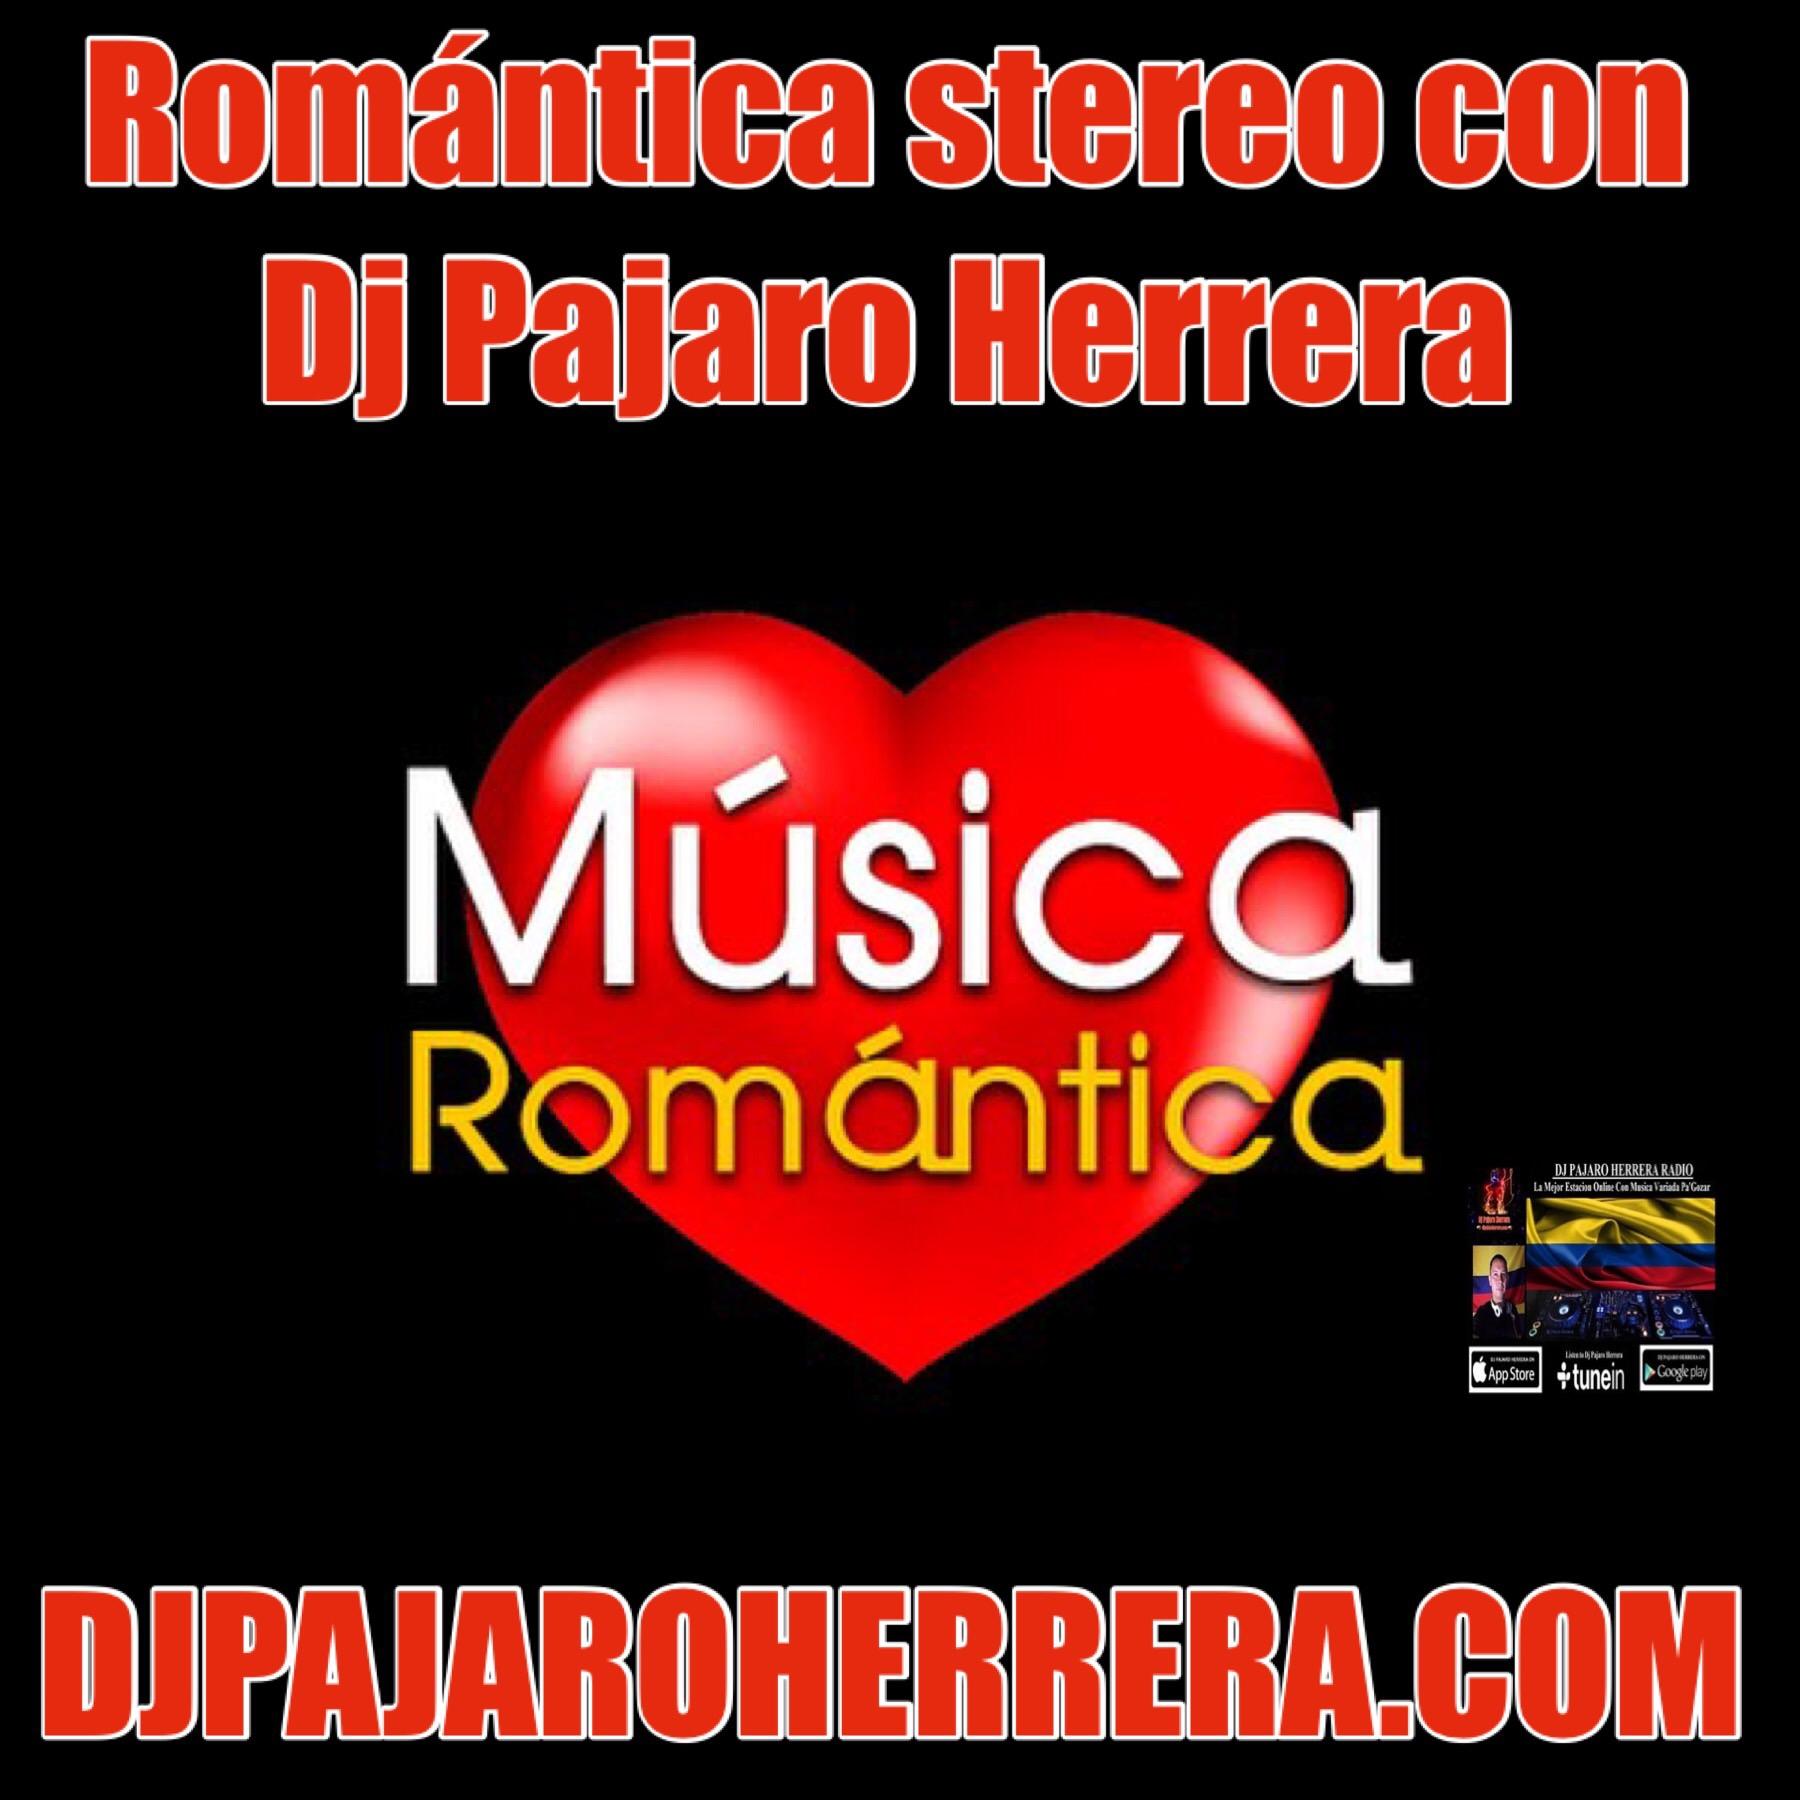 Romantica Stereo y Dj Pajaro Herrera